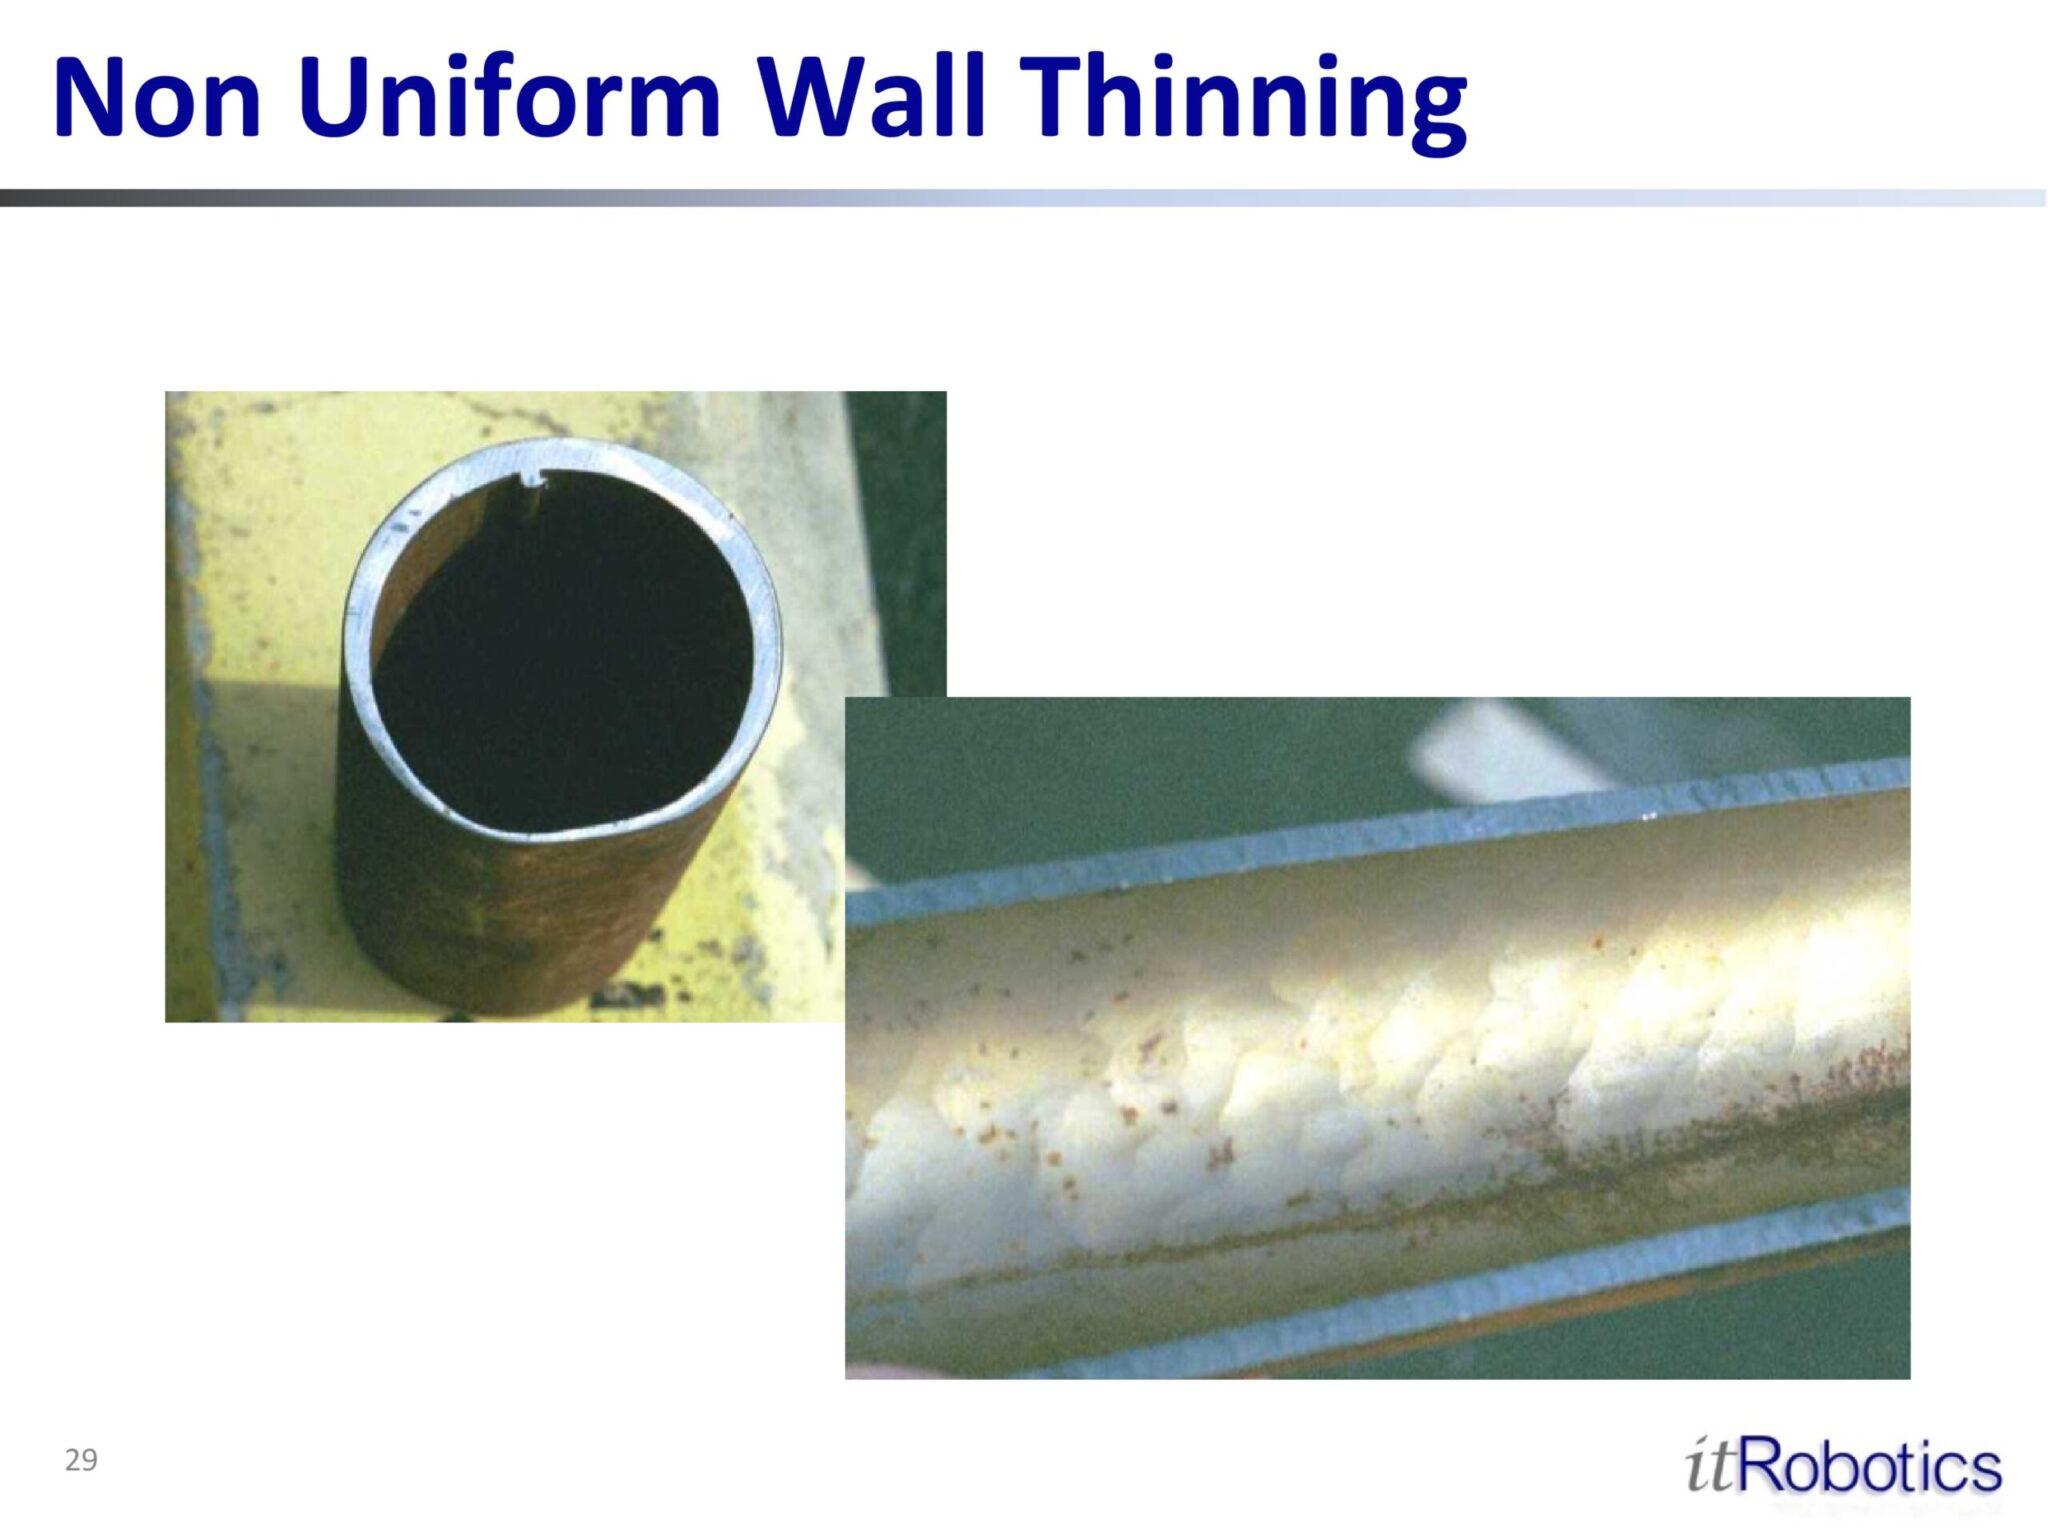 Non Uniform Wall Thinning